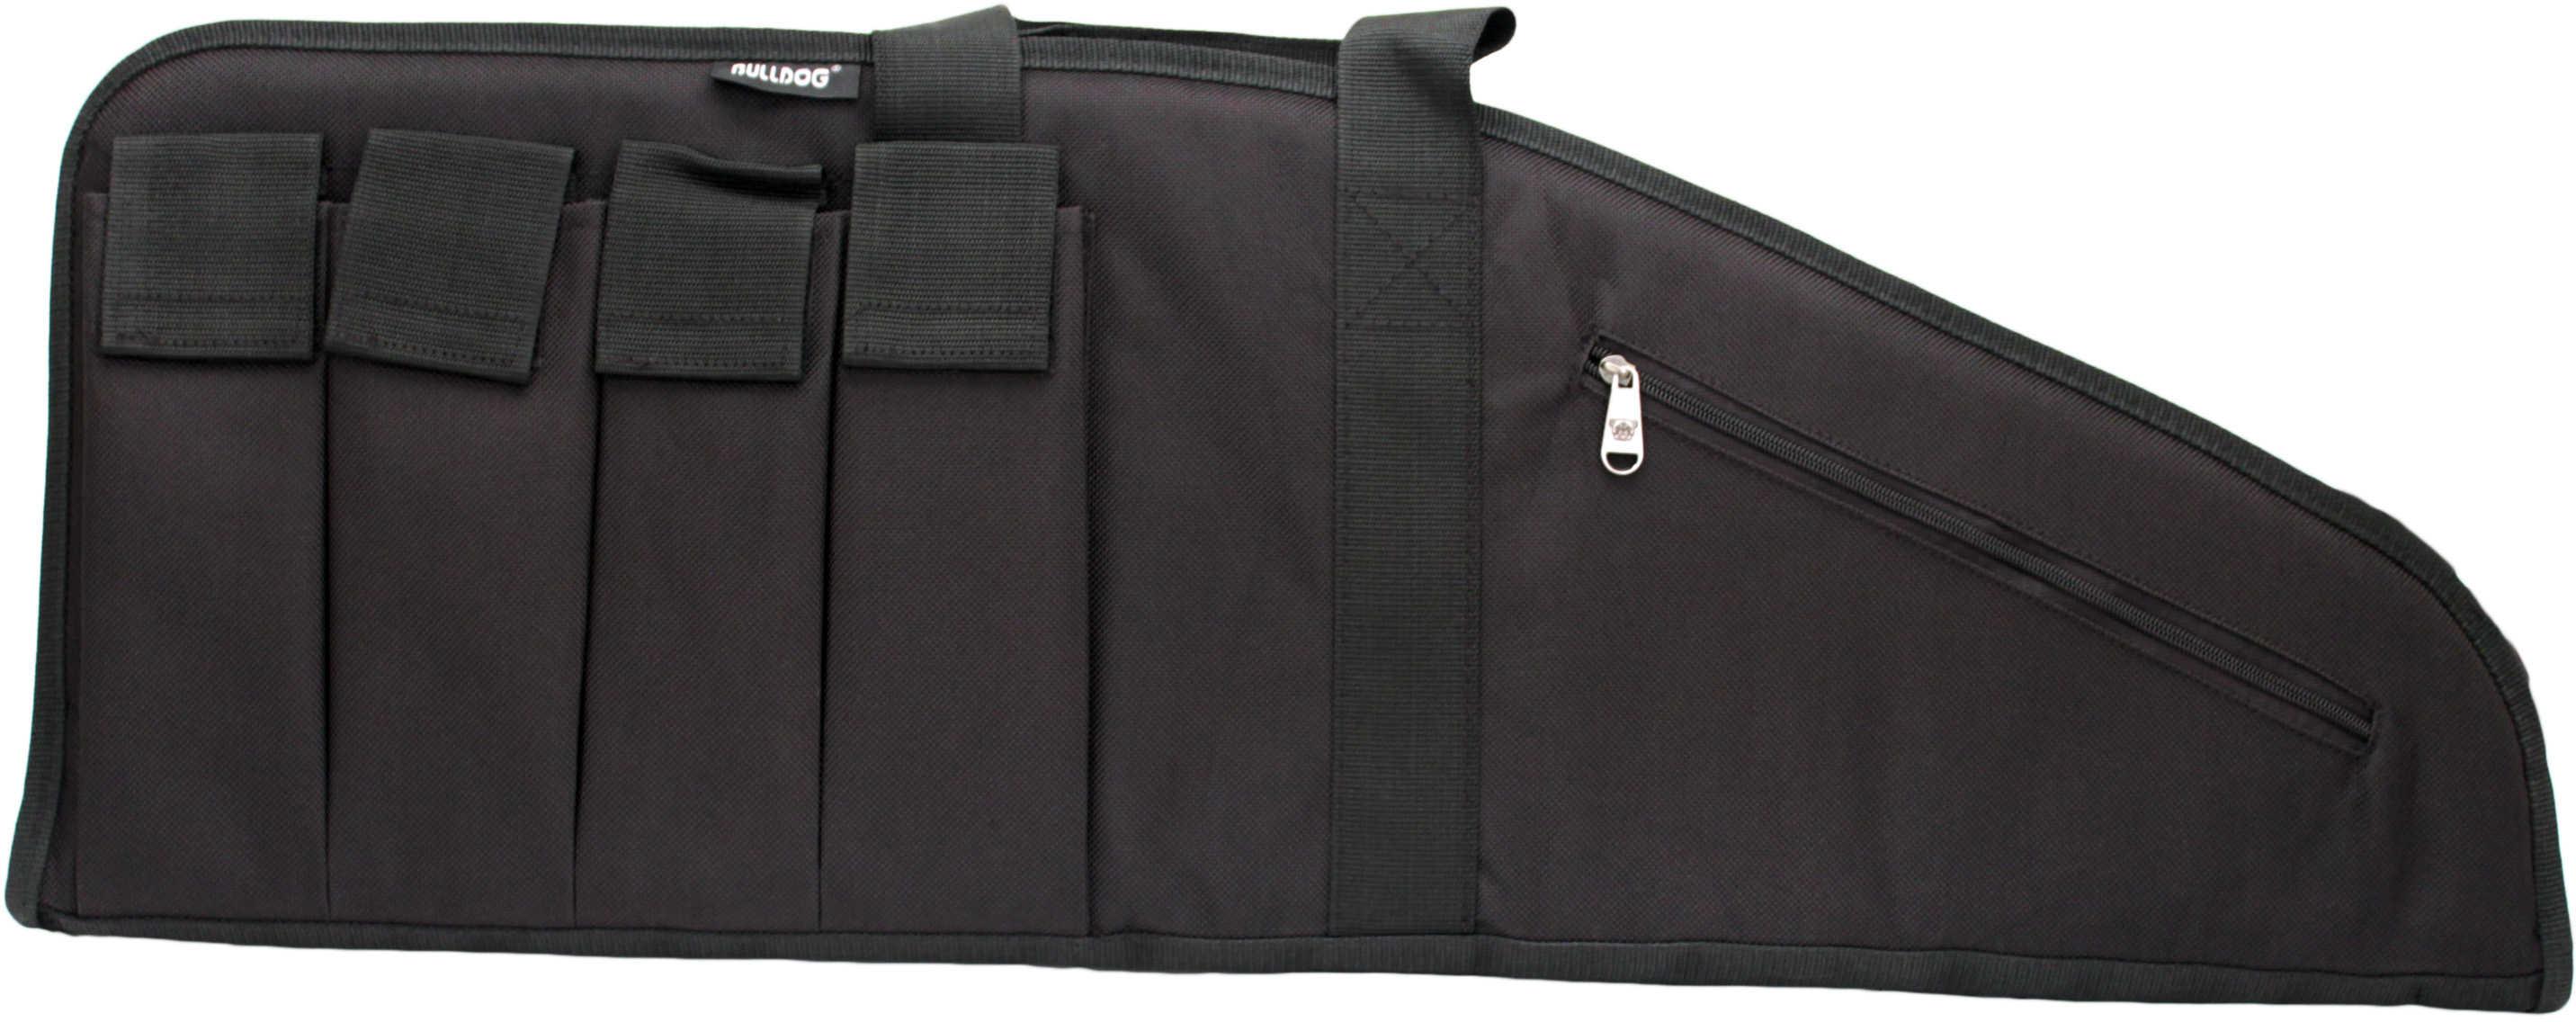 "Bulldog Cases Bulldog Tactical Extreme 35"" Black With Black Trim 422"